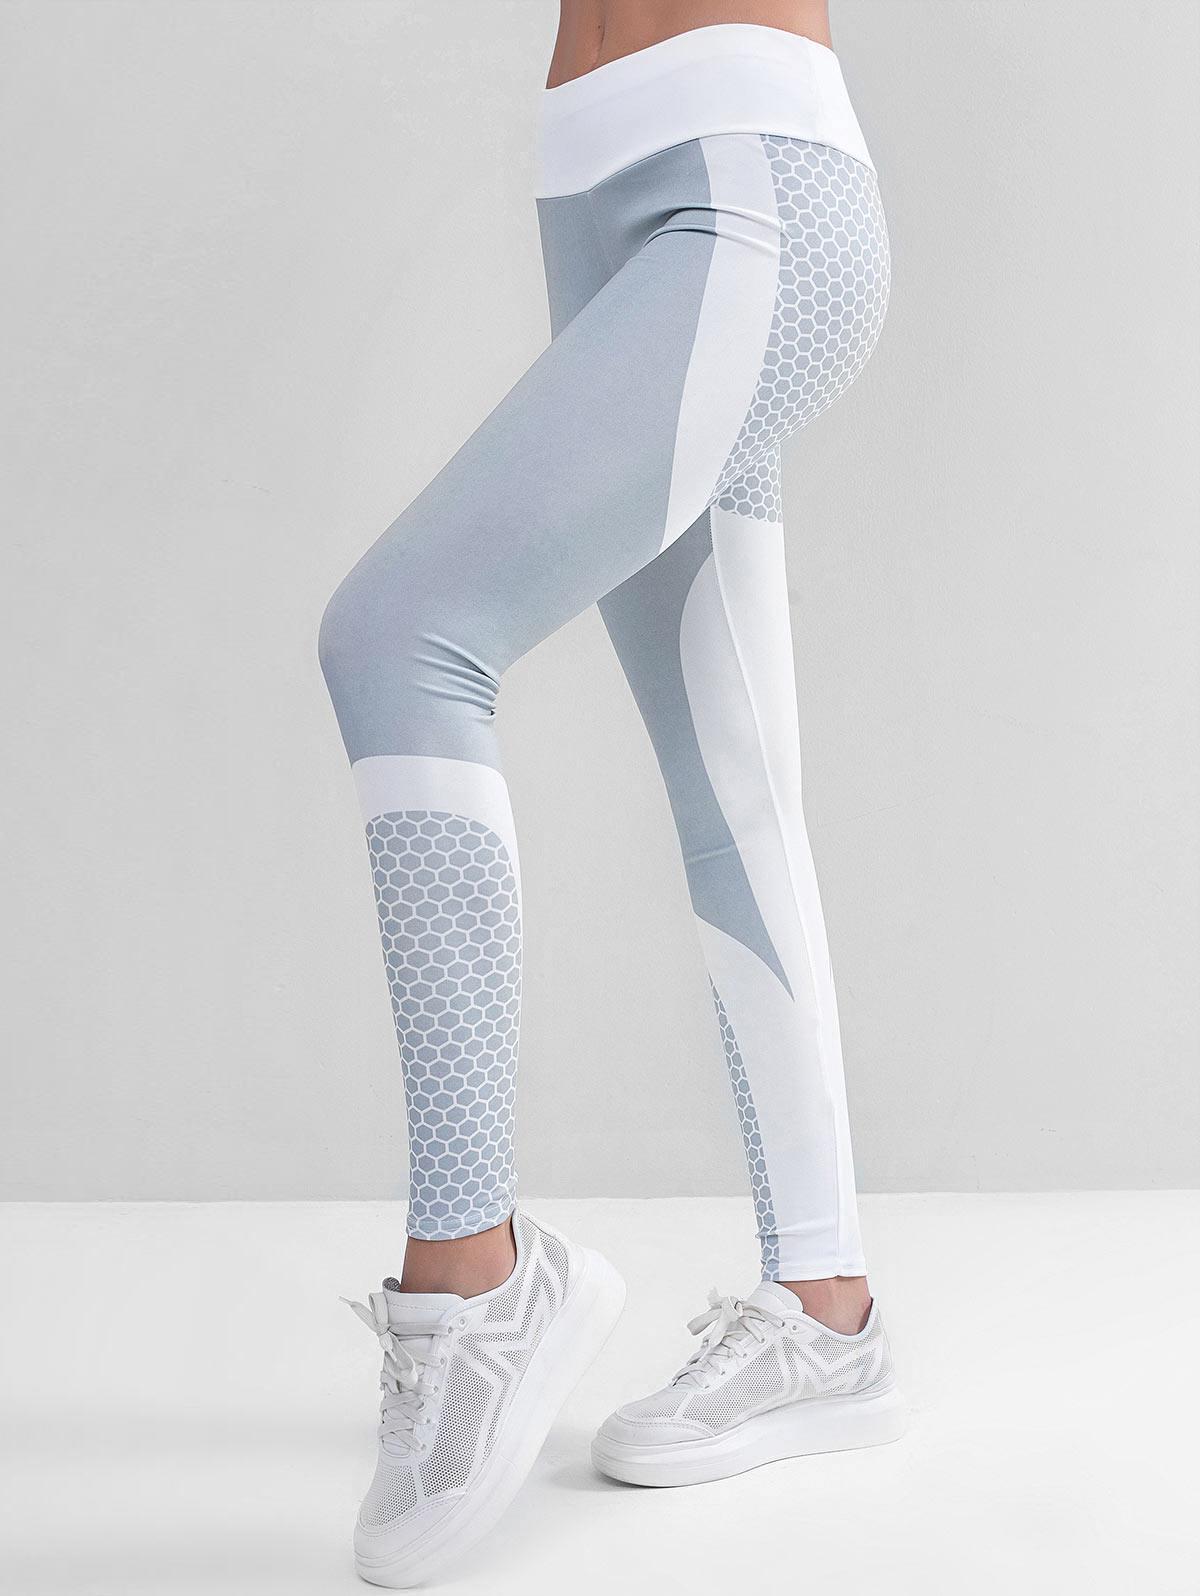 Two Tone Honeycomb Workout Gym Leggings, White